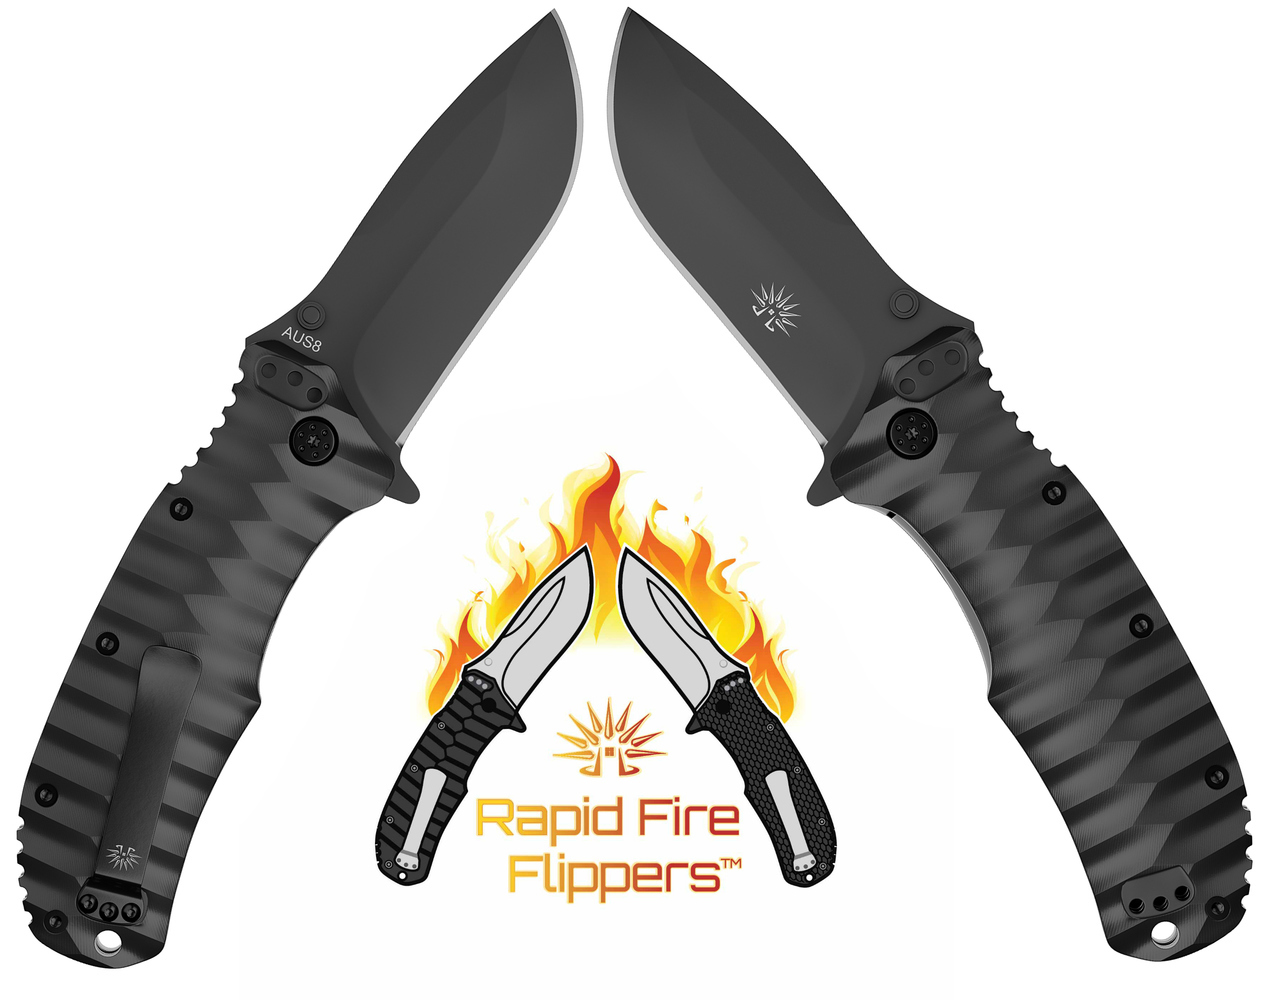 off-grid-rapid-fire.jpg